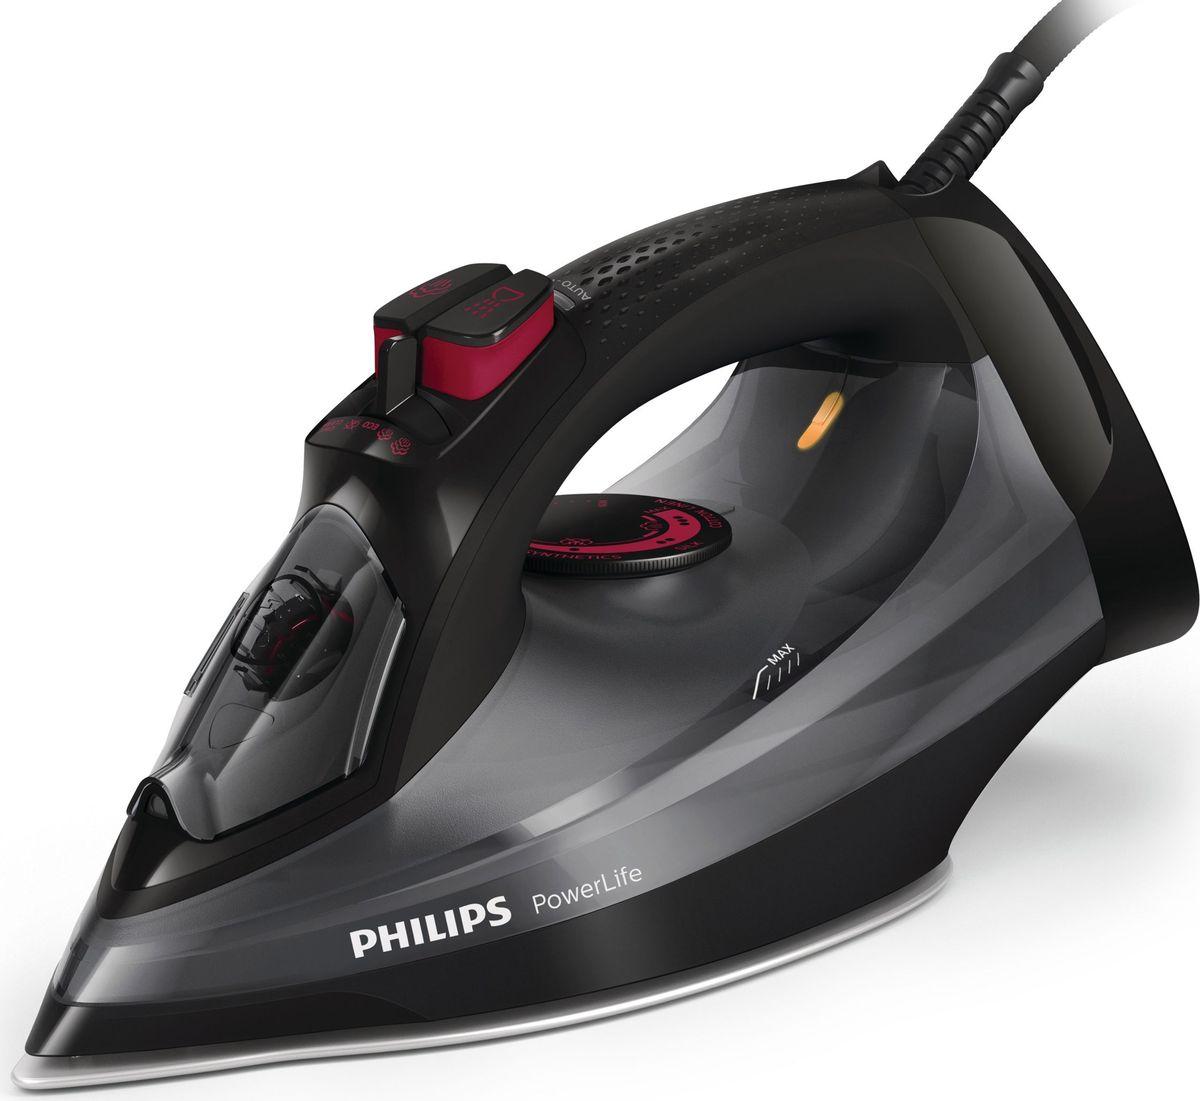 Фото - Утюг Philips GC2998/80 PowerLife, Black Dark Gray утюг philips 2500 вт удар 200г подача 45 г мин подошва steamglide plus красный белый